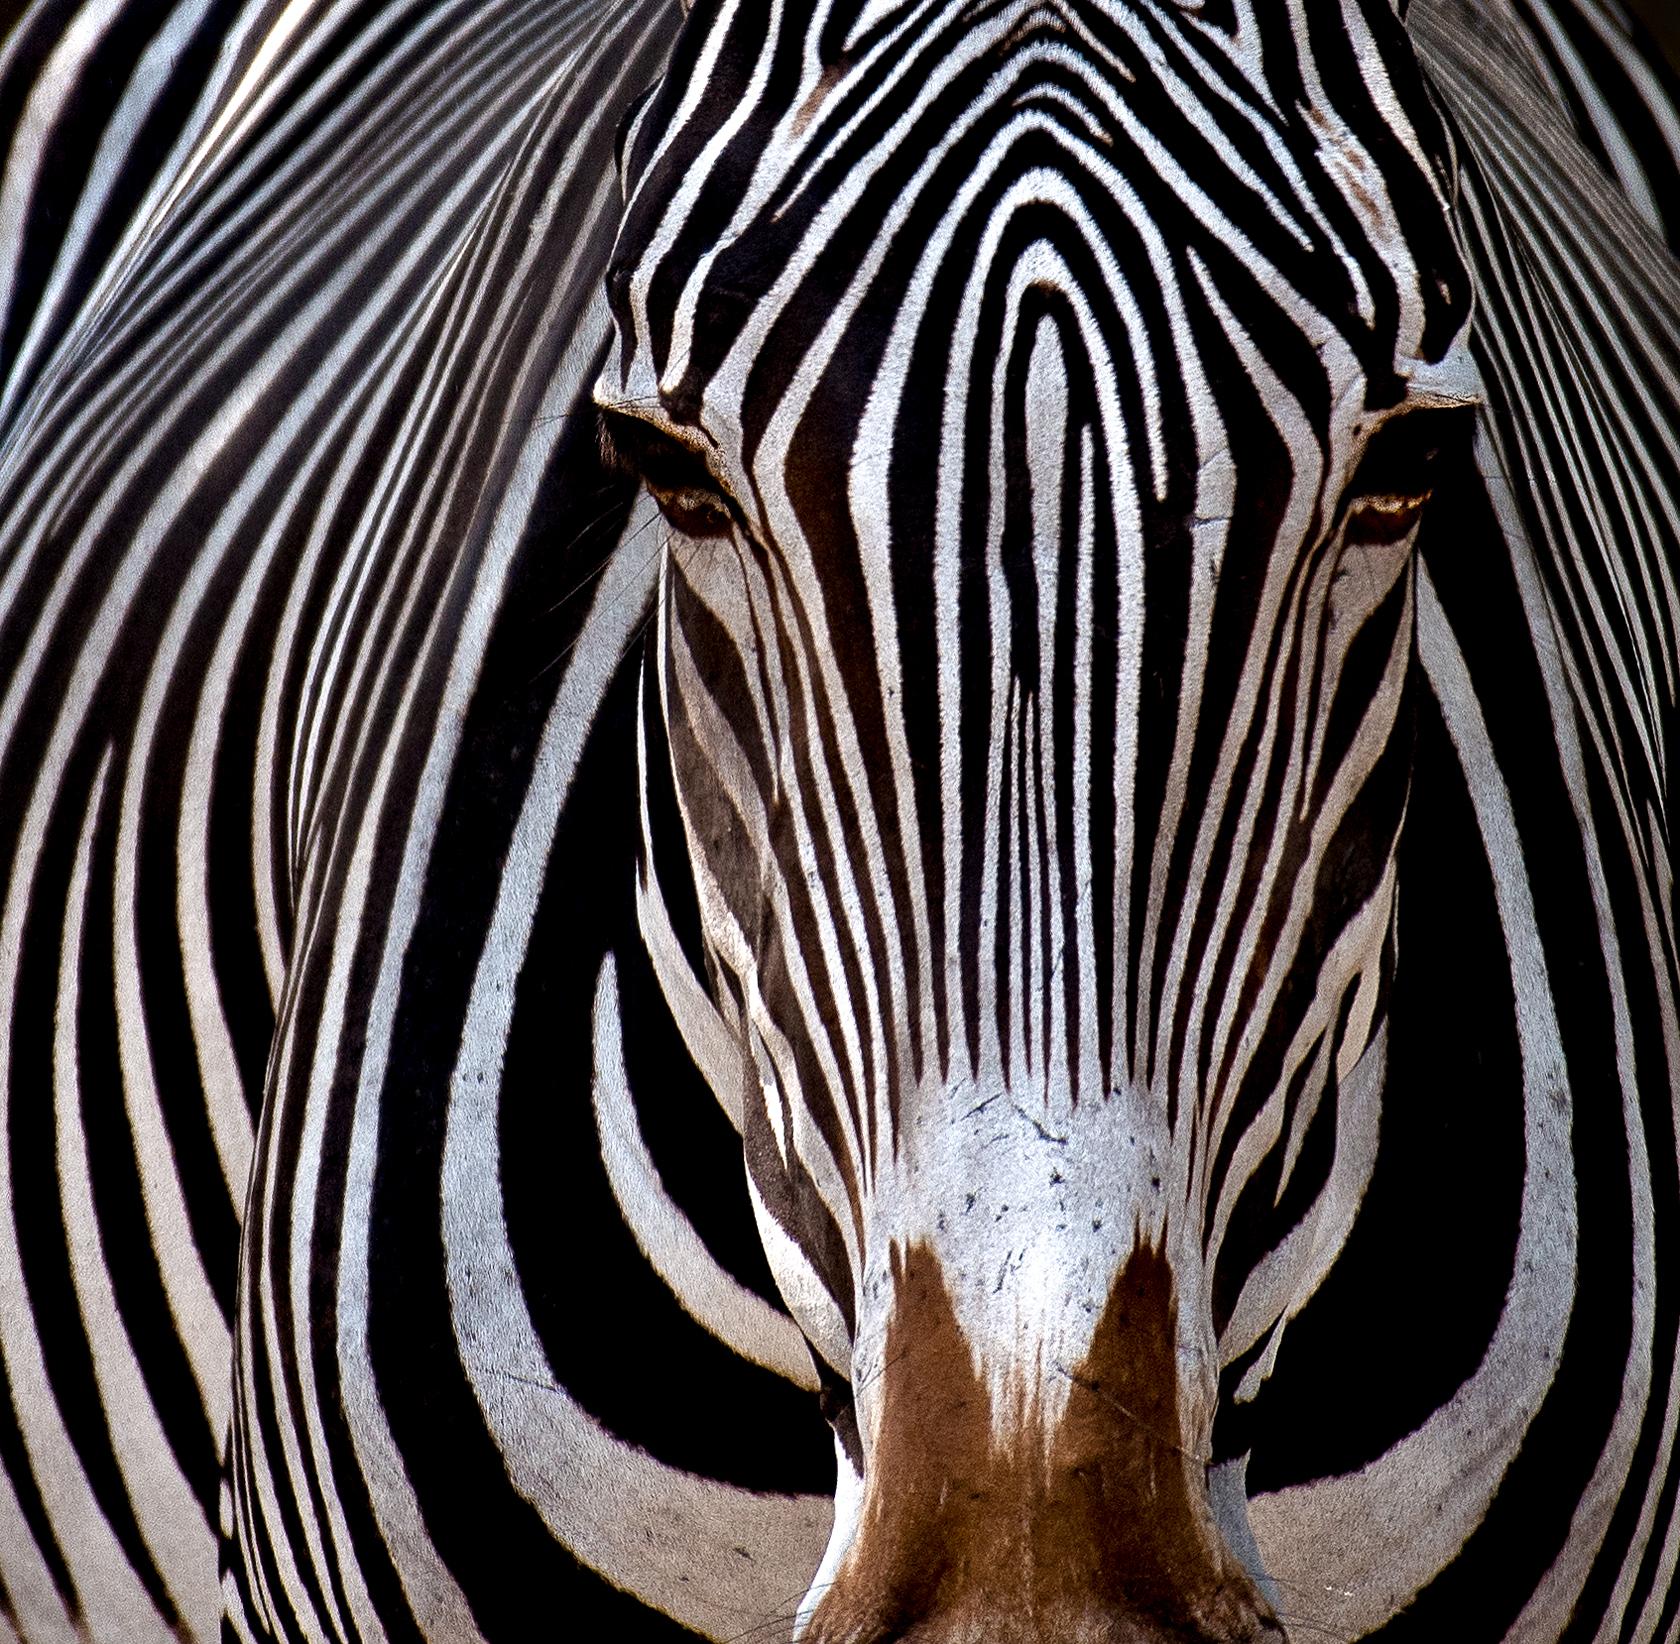 Zebra©BrianRiveraUncapher.jpg